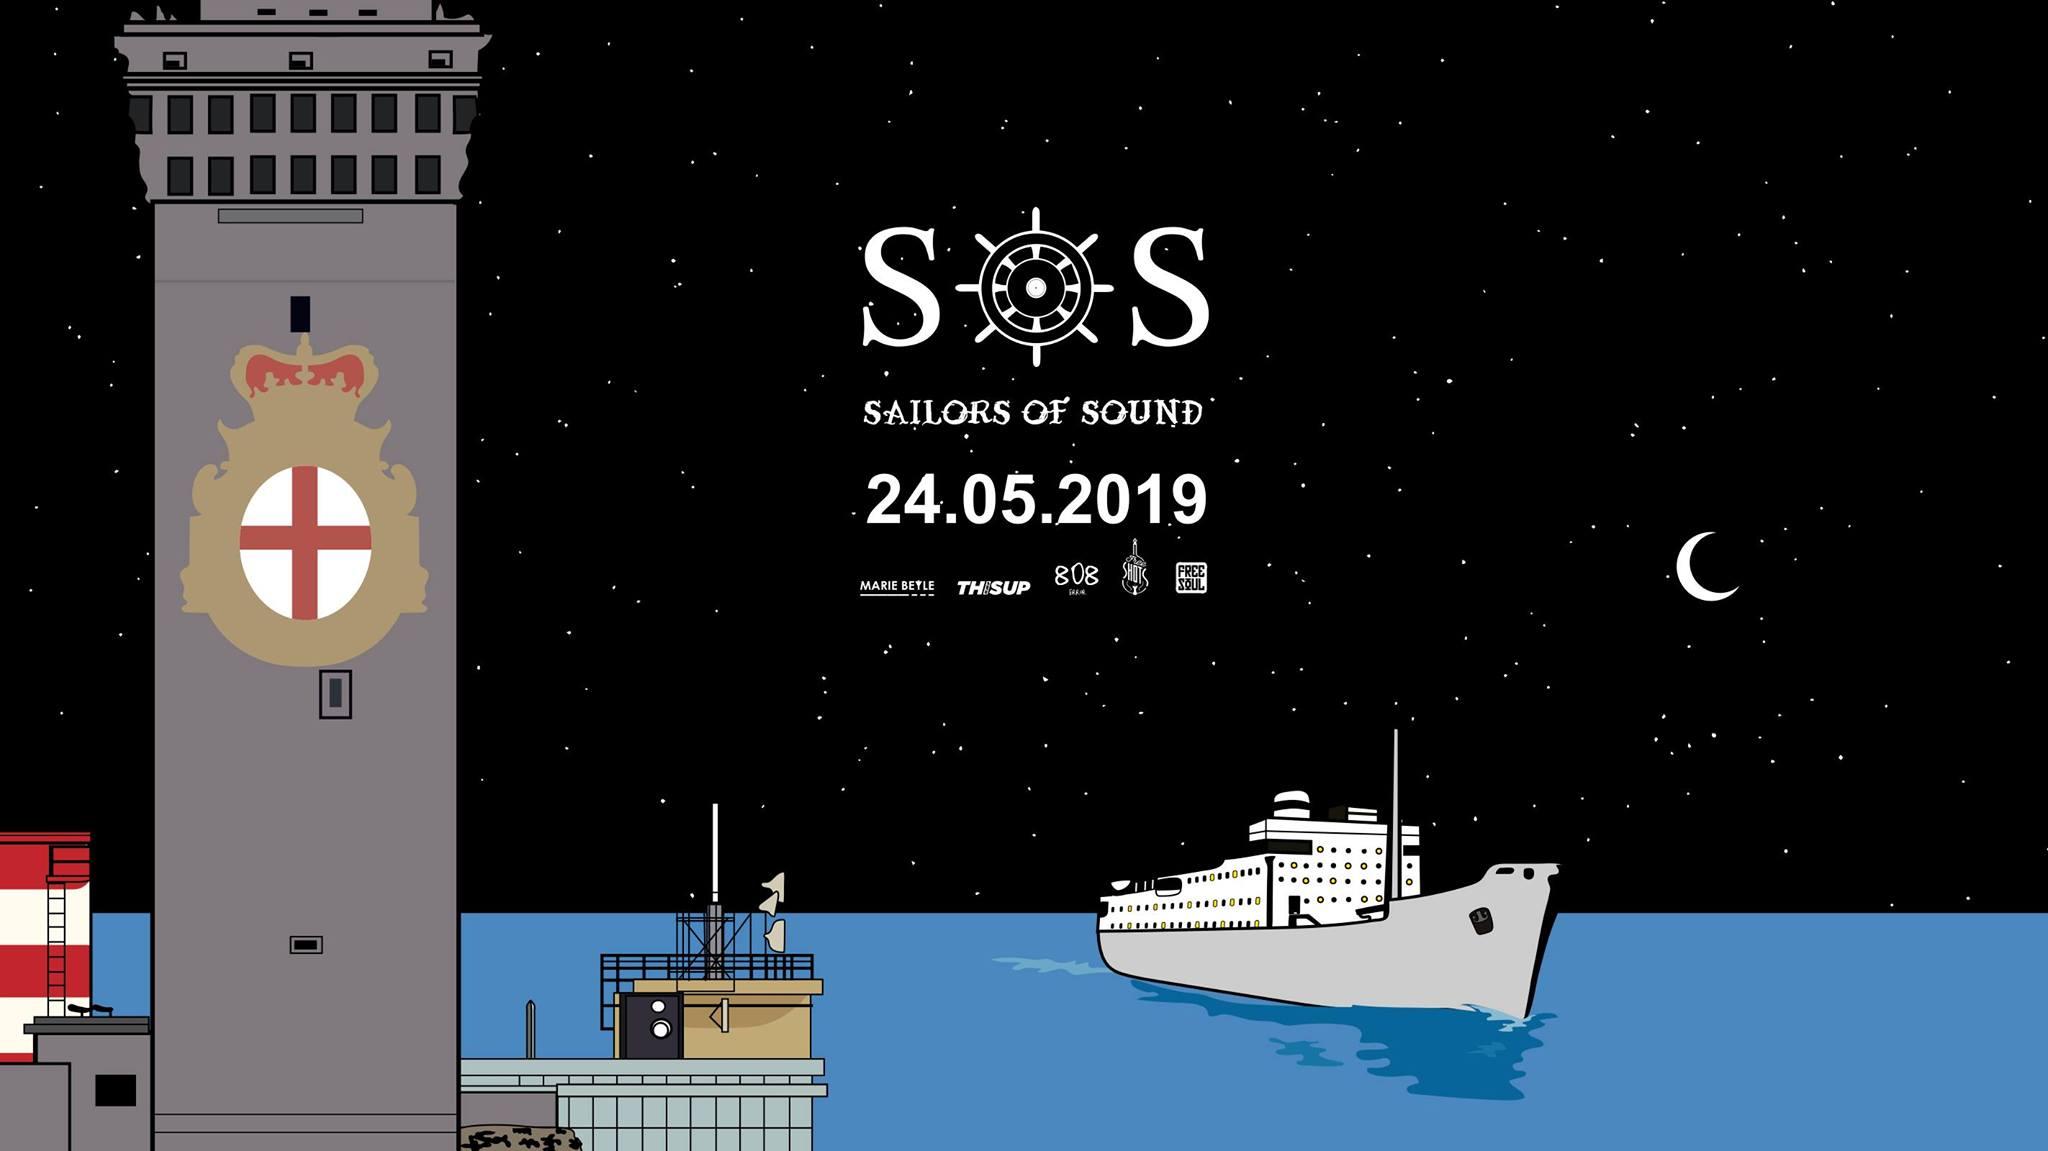 Sailors of sound